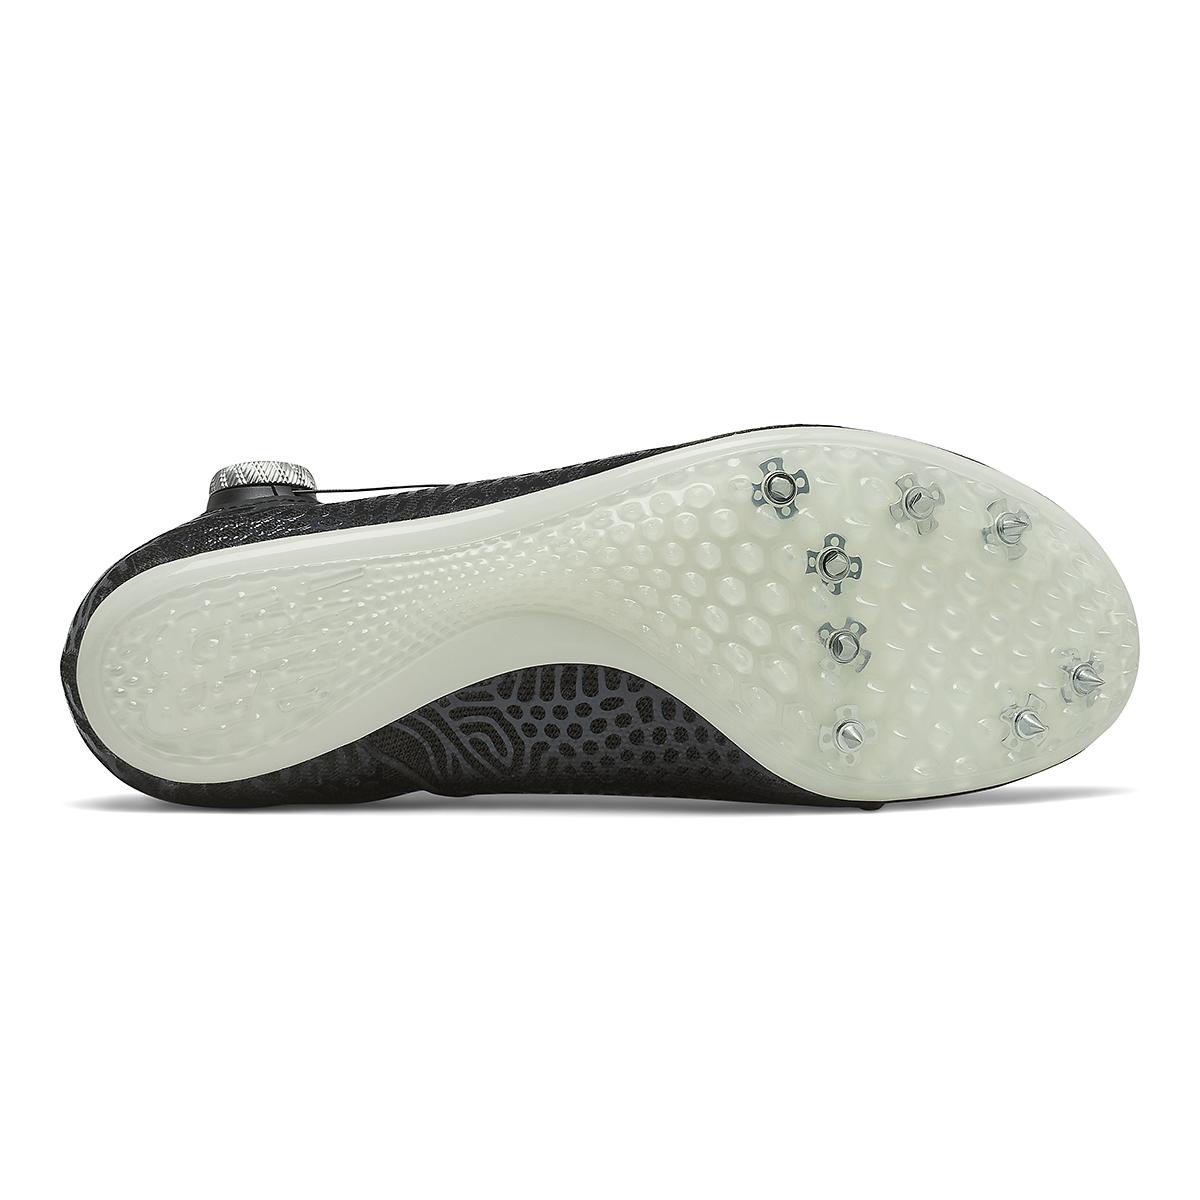 Men's New Balance Sigma Harmony V2 Track Spikes - Color: Black/White - Size: 4.5 - Width: Regular, Black/White, large, image 4